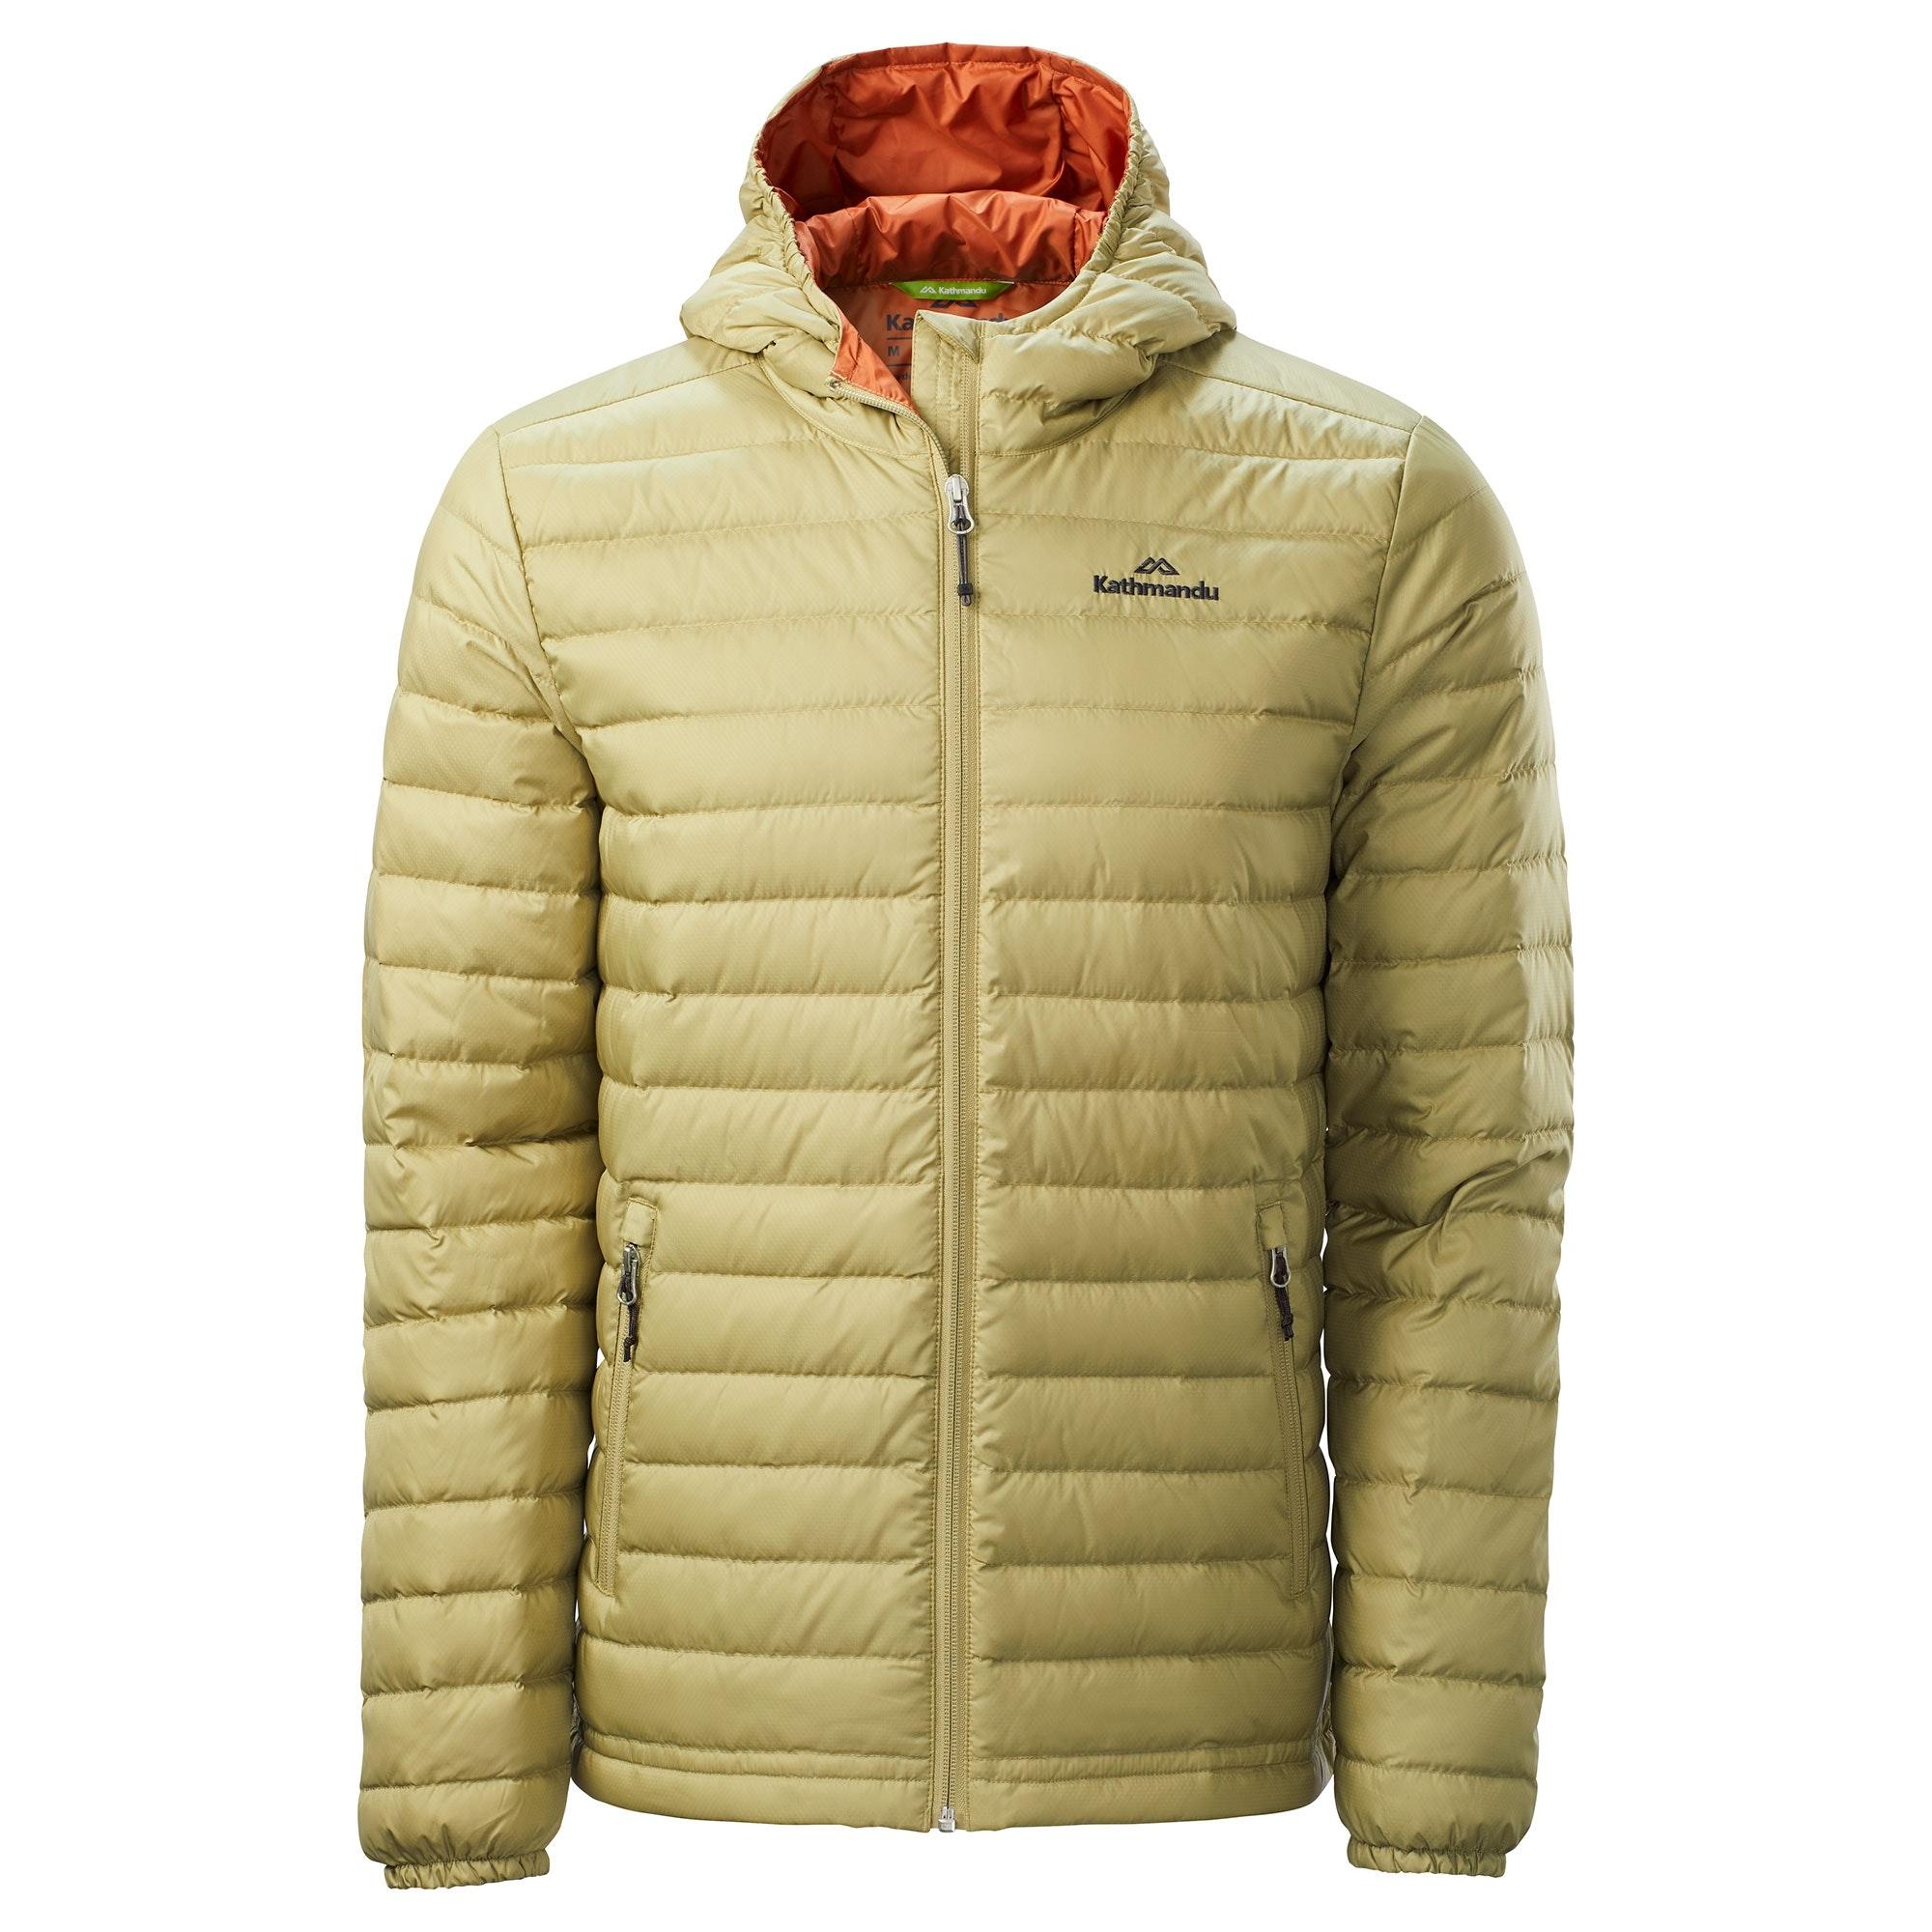 46848817b1c Heli Men s Hooded Down Jacket